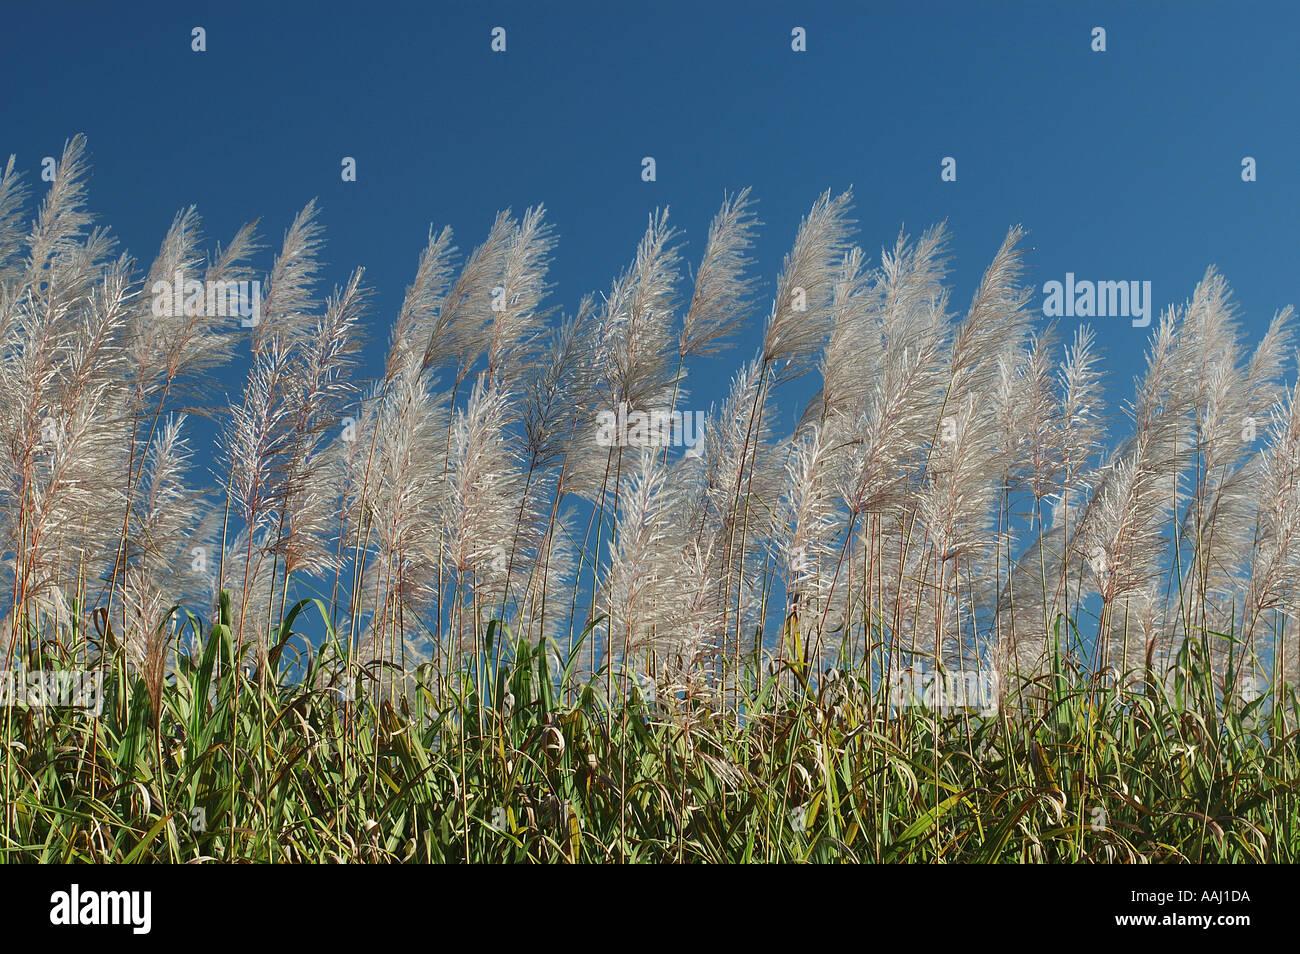 Sugarcane Transport Stock Photos & Sugarcane Transport Stock Images